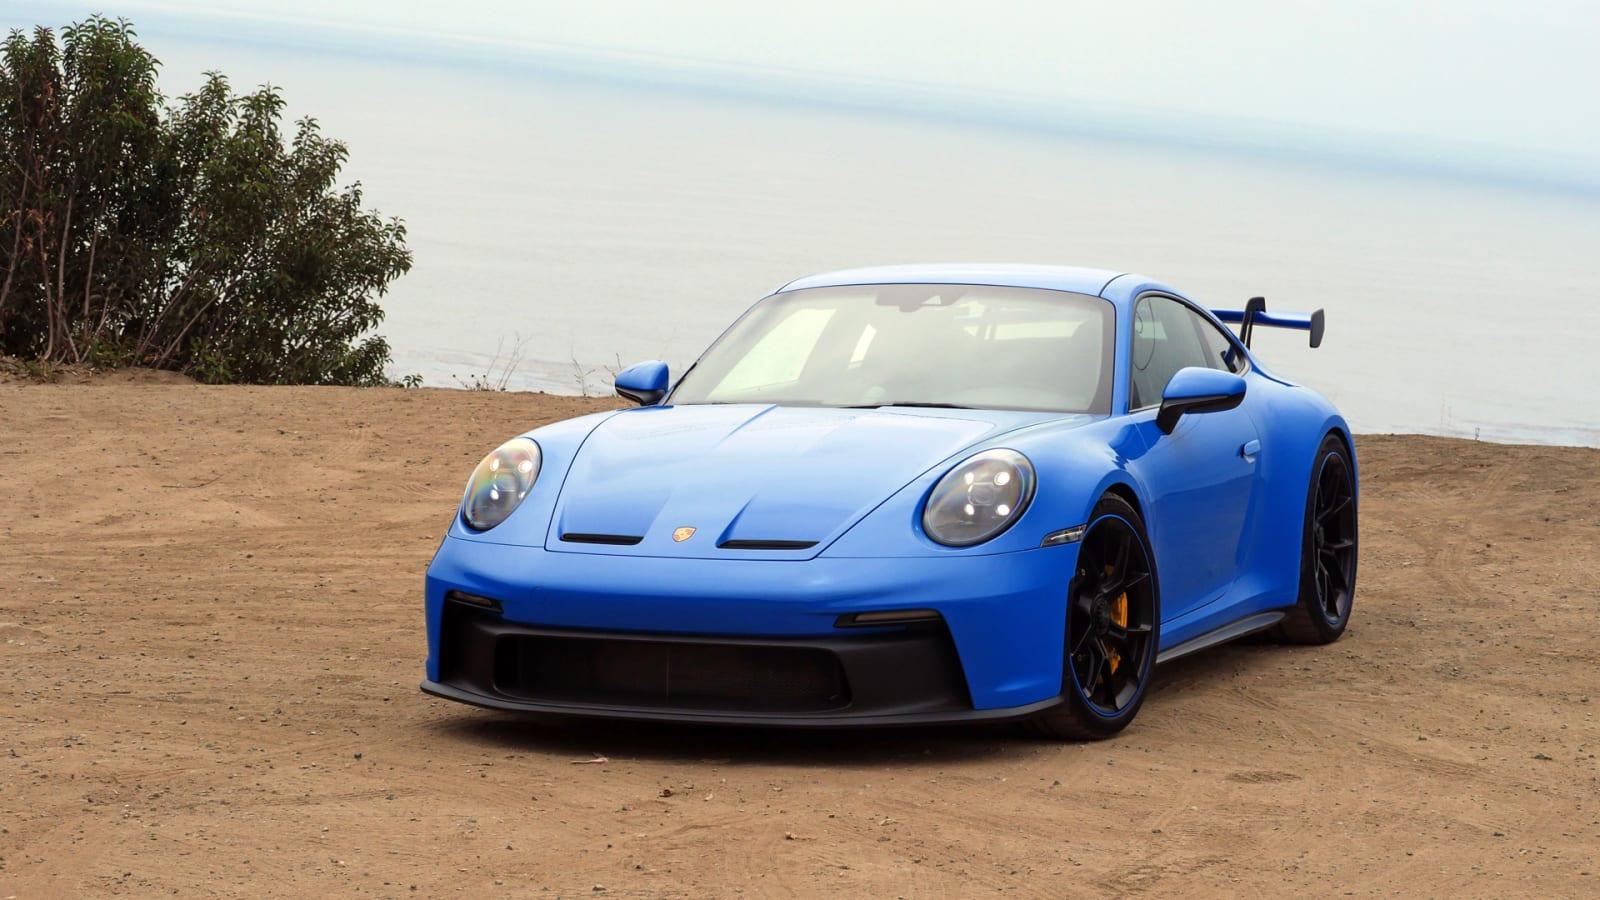 2022 Porsche 911 GT3 with the ocean